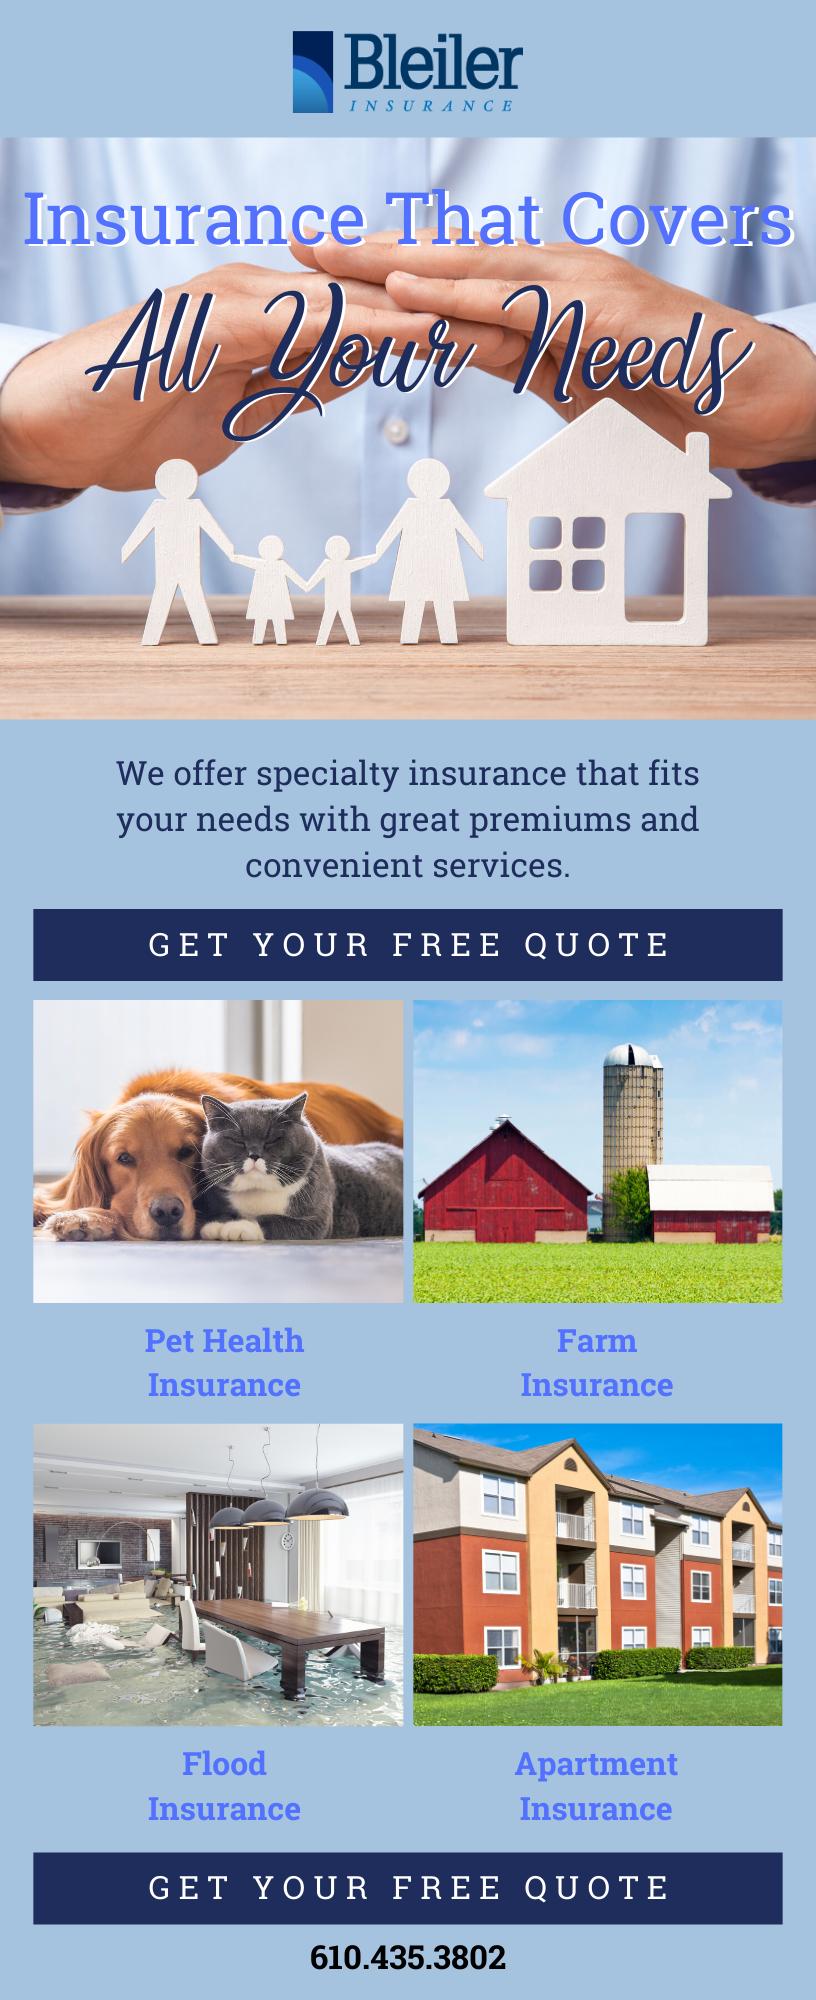 InsuranceForAllYourNeeds